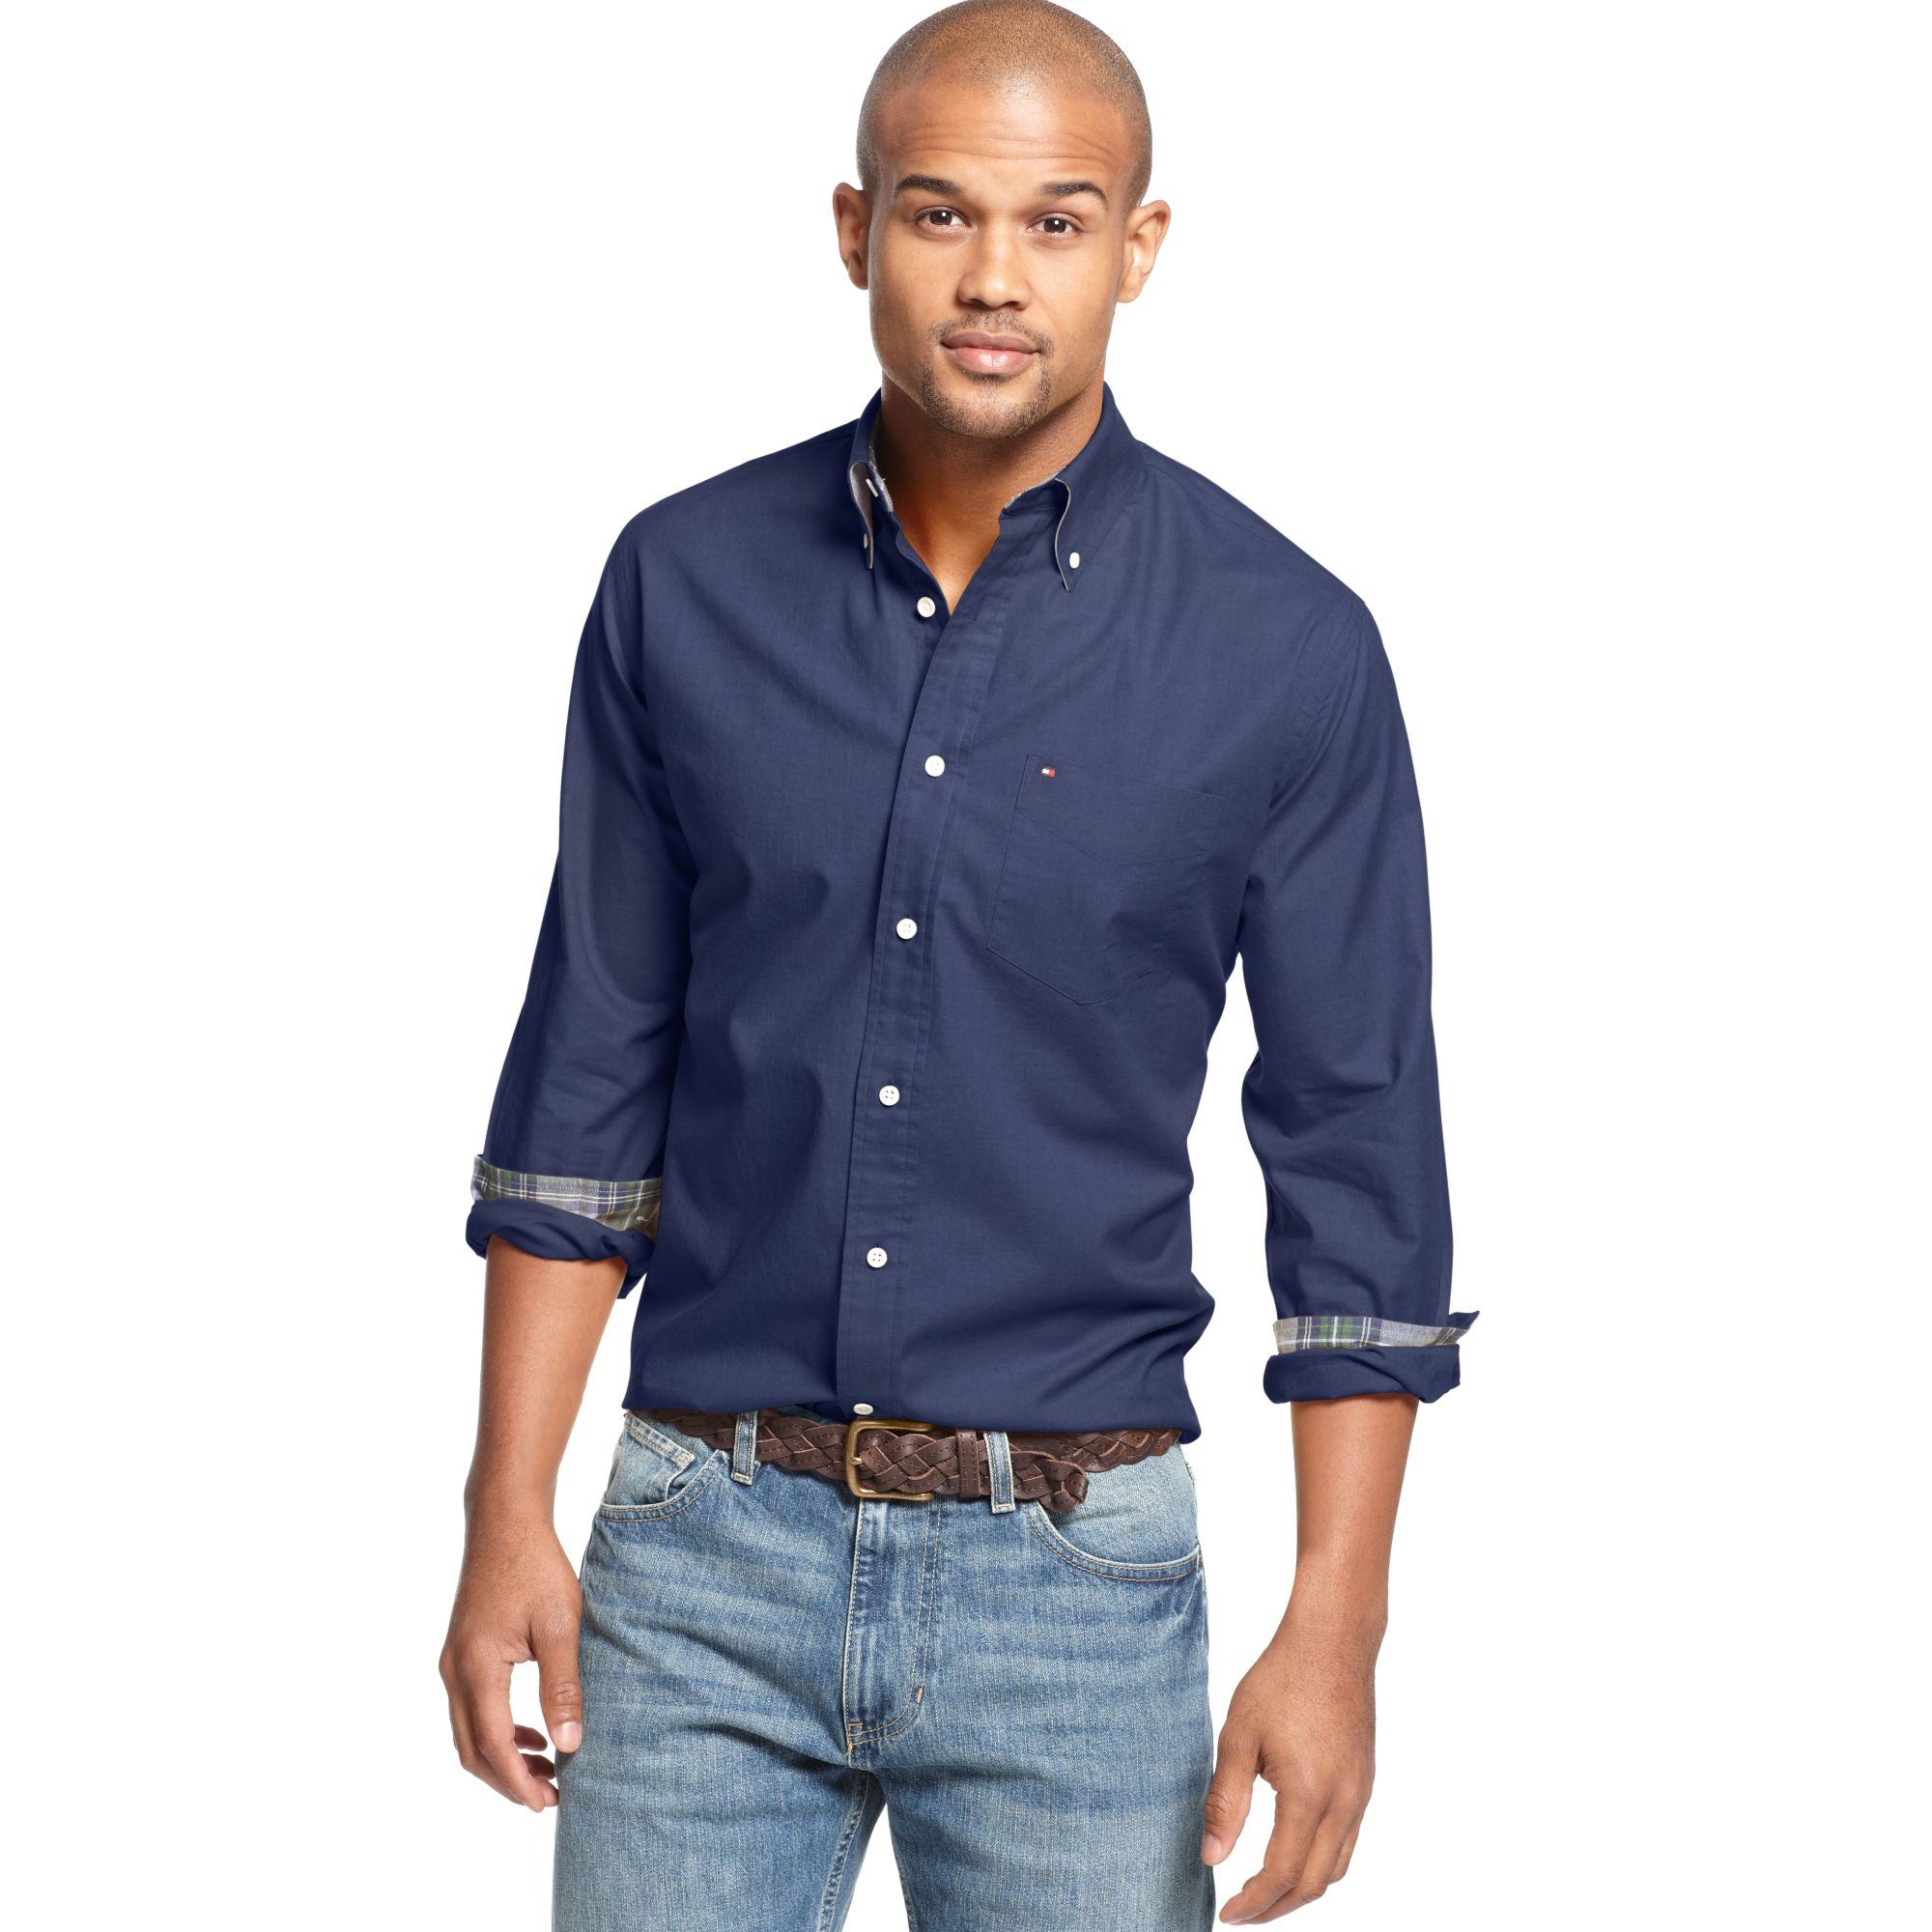 eda4463e Tommy Hilfiger Hartley Heather Twill Shirt in Blue for Men - Lyst